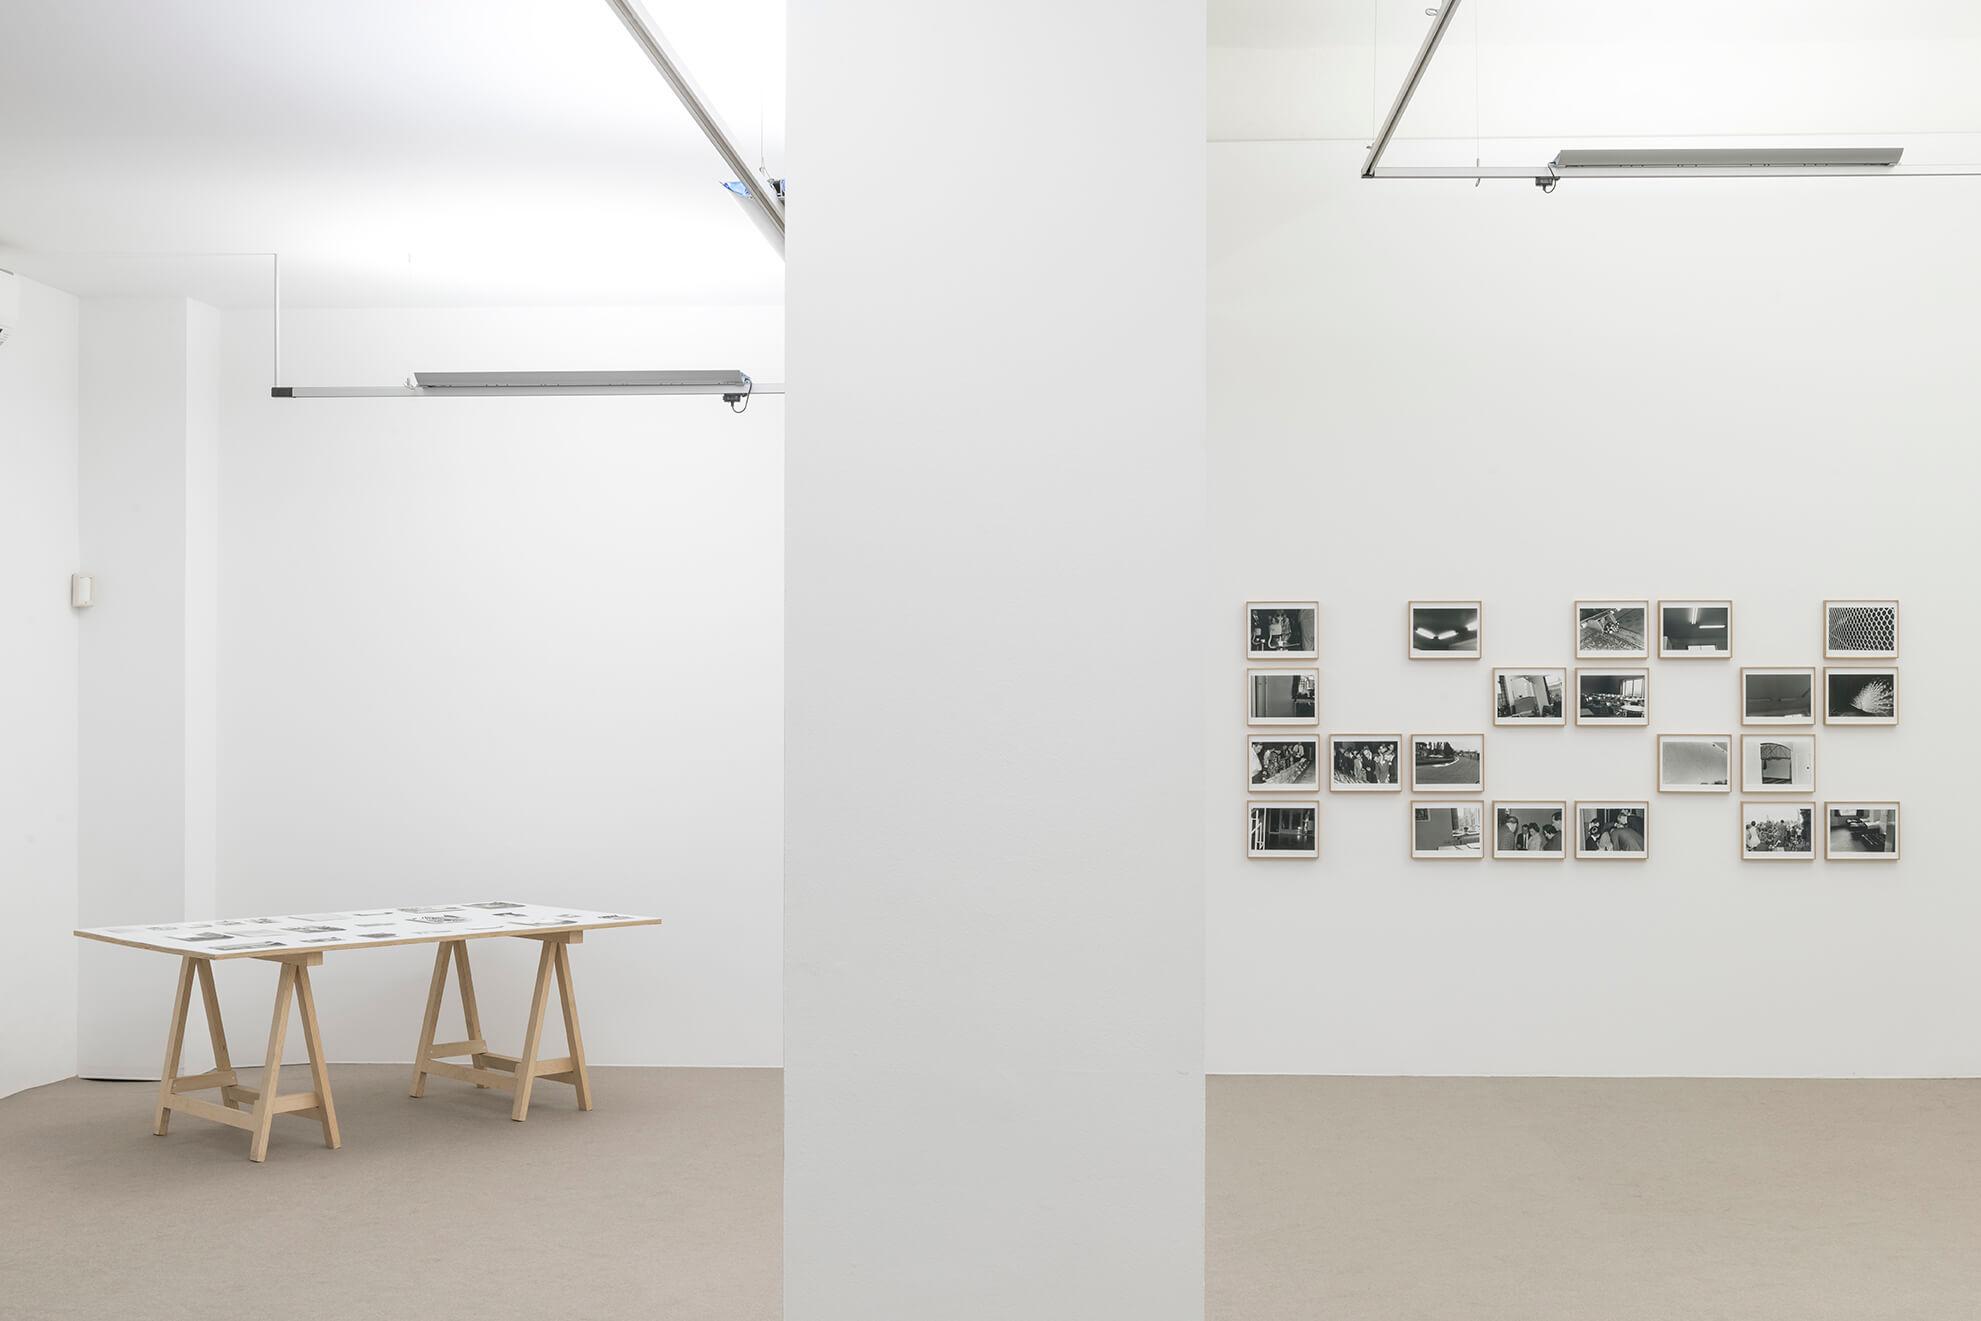 Installation view: Accrochage #5: Set petites històries, ProjecteSD | Lara Fluxà: Delu / Accrochage #5: Set Petites Històries | ProjecteSD